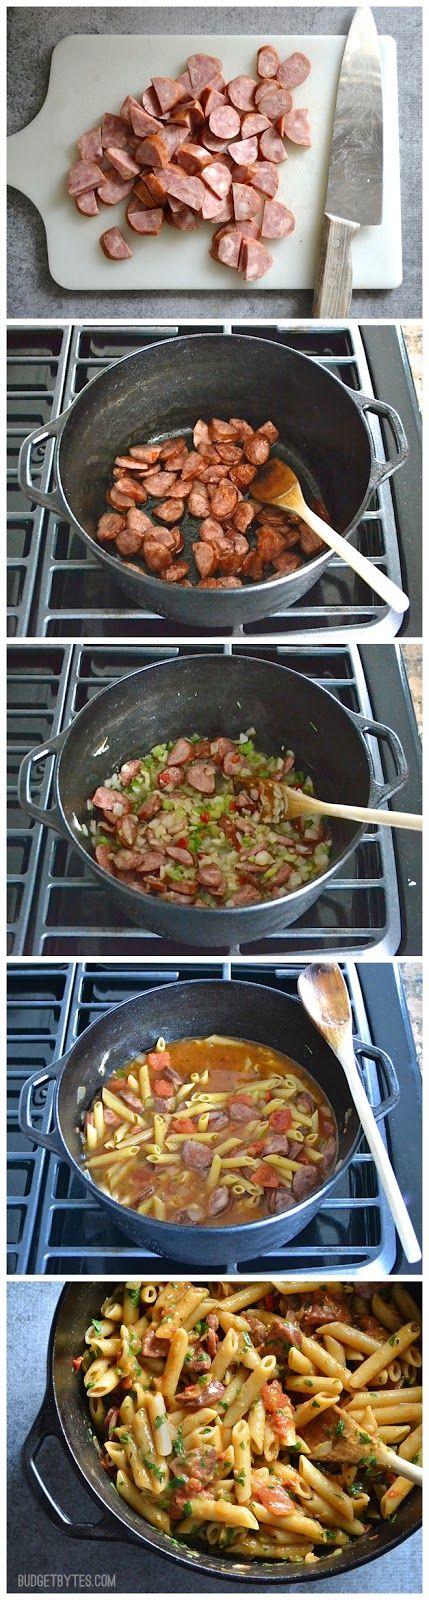 "Pastalaya   Ingredients    1 Tbsp vegetable oil  ½ lb. smoked sausage (preferably Andouille)  2 cloves garlic  1 10oz. bag frozen ""seas..."